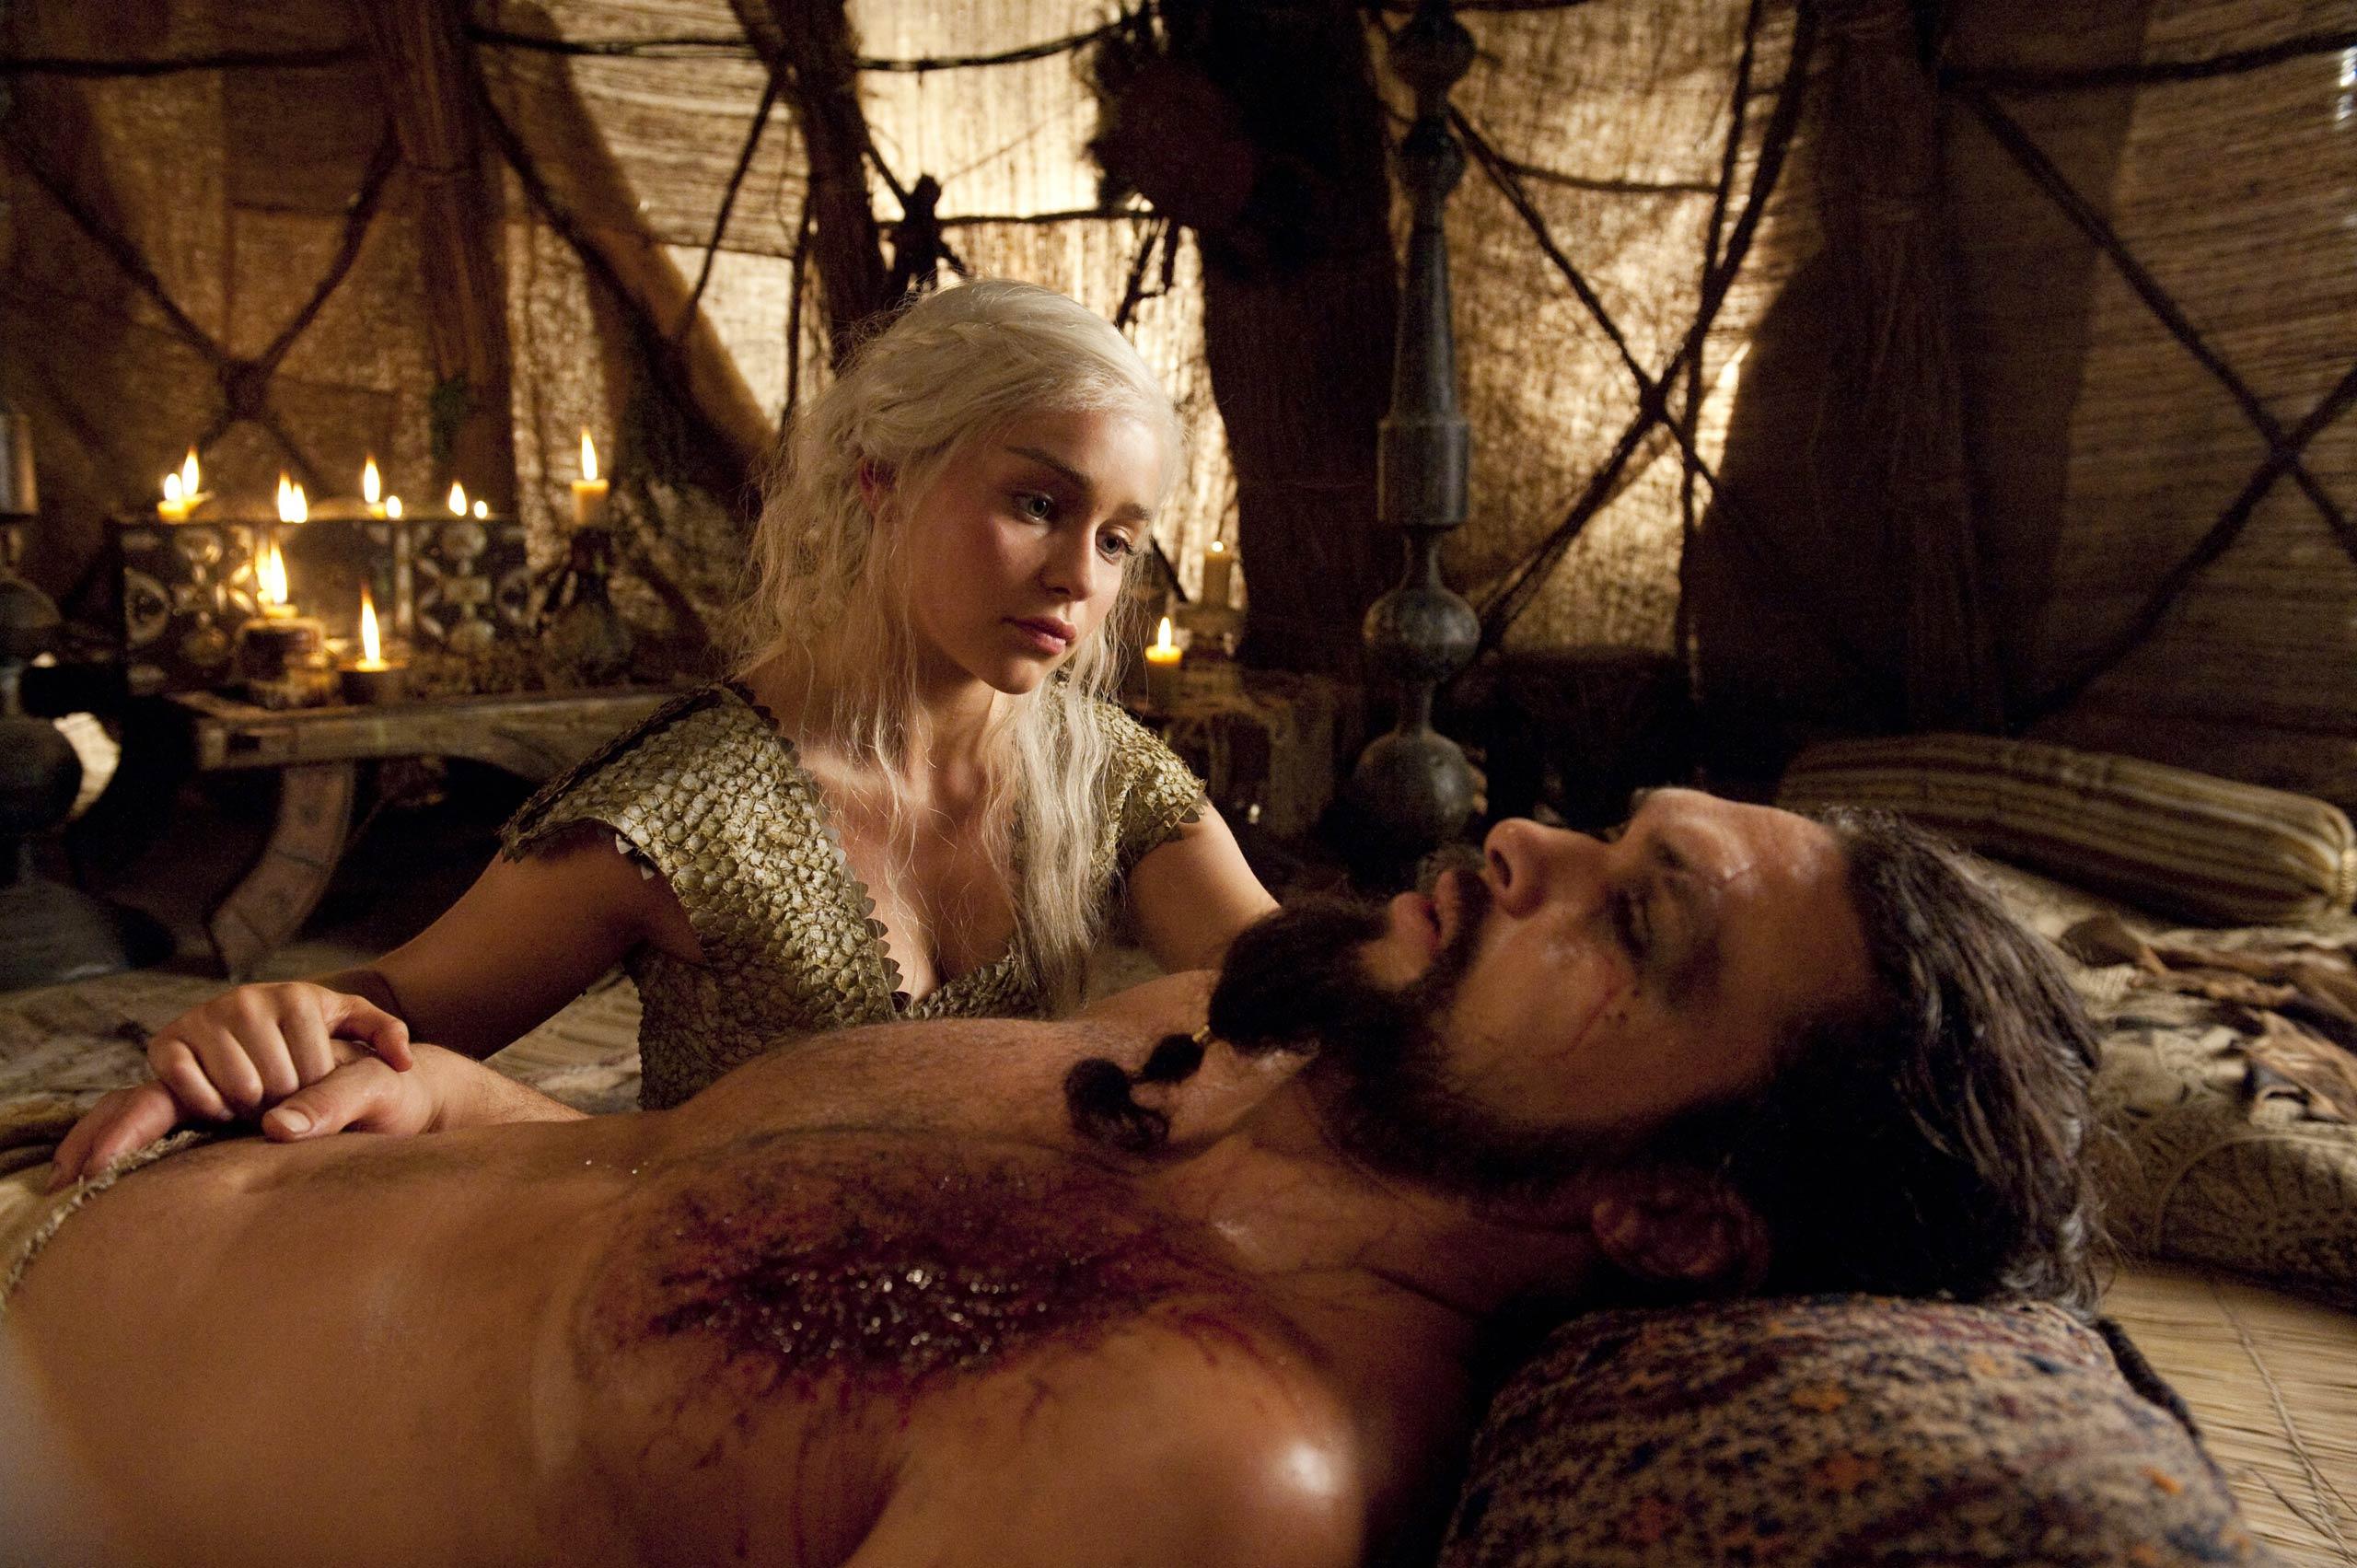 Jason Momoa and Emilia Clarke in Game of Thrones